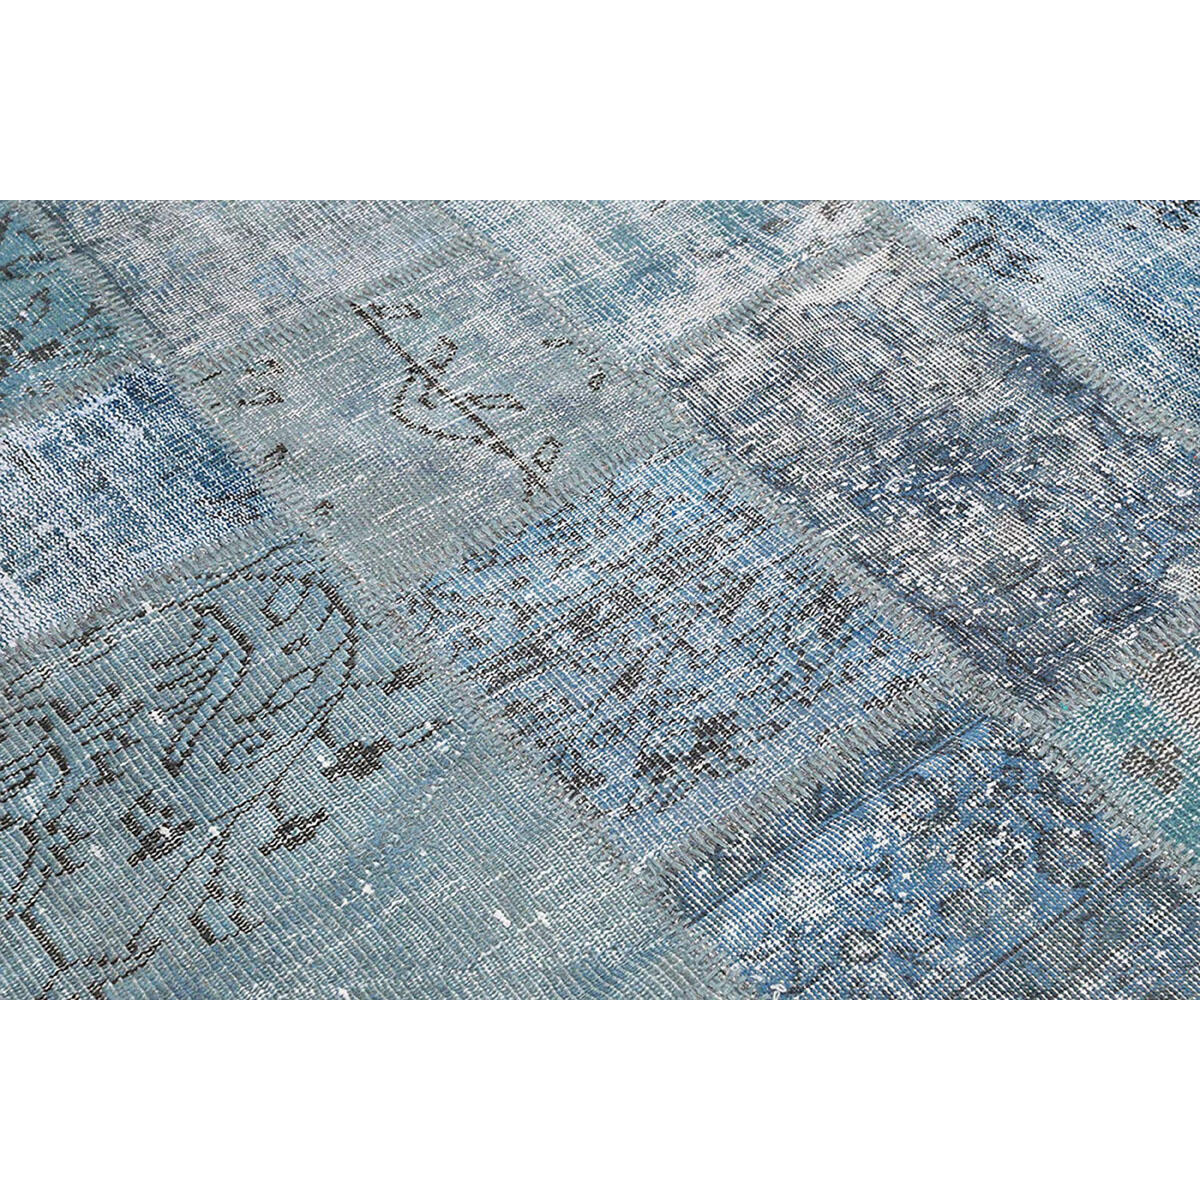 Tappeto Anatolian patchwork in lana, grigio, 60x200 - 3